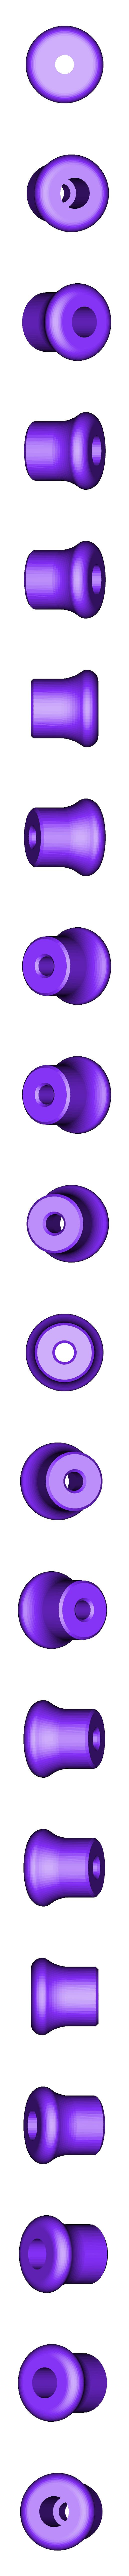 knob.STL Download free STL file PortaReel Portable Fishing Pole • 3D printable model, mechengineermike